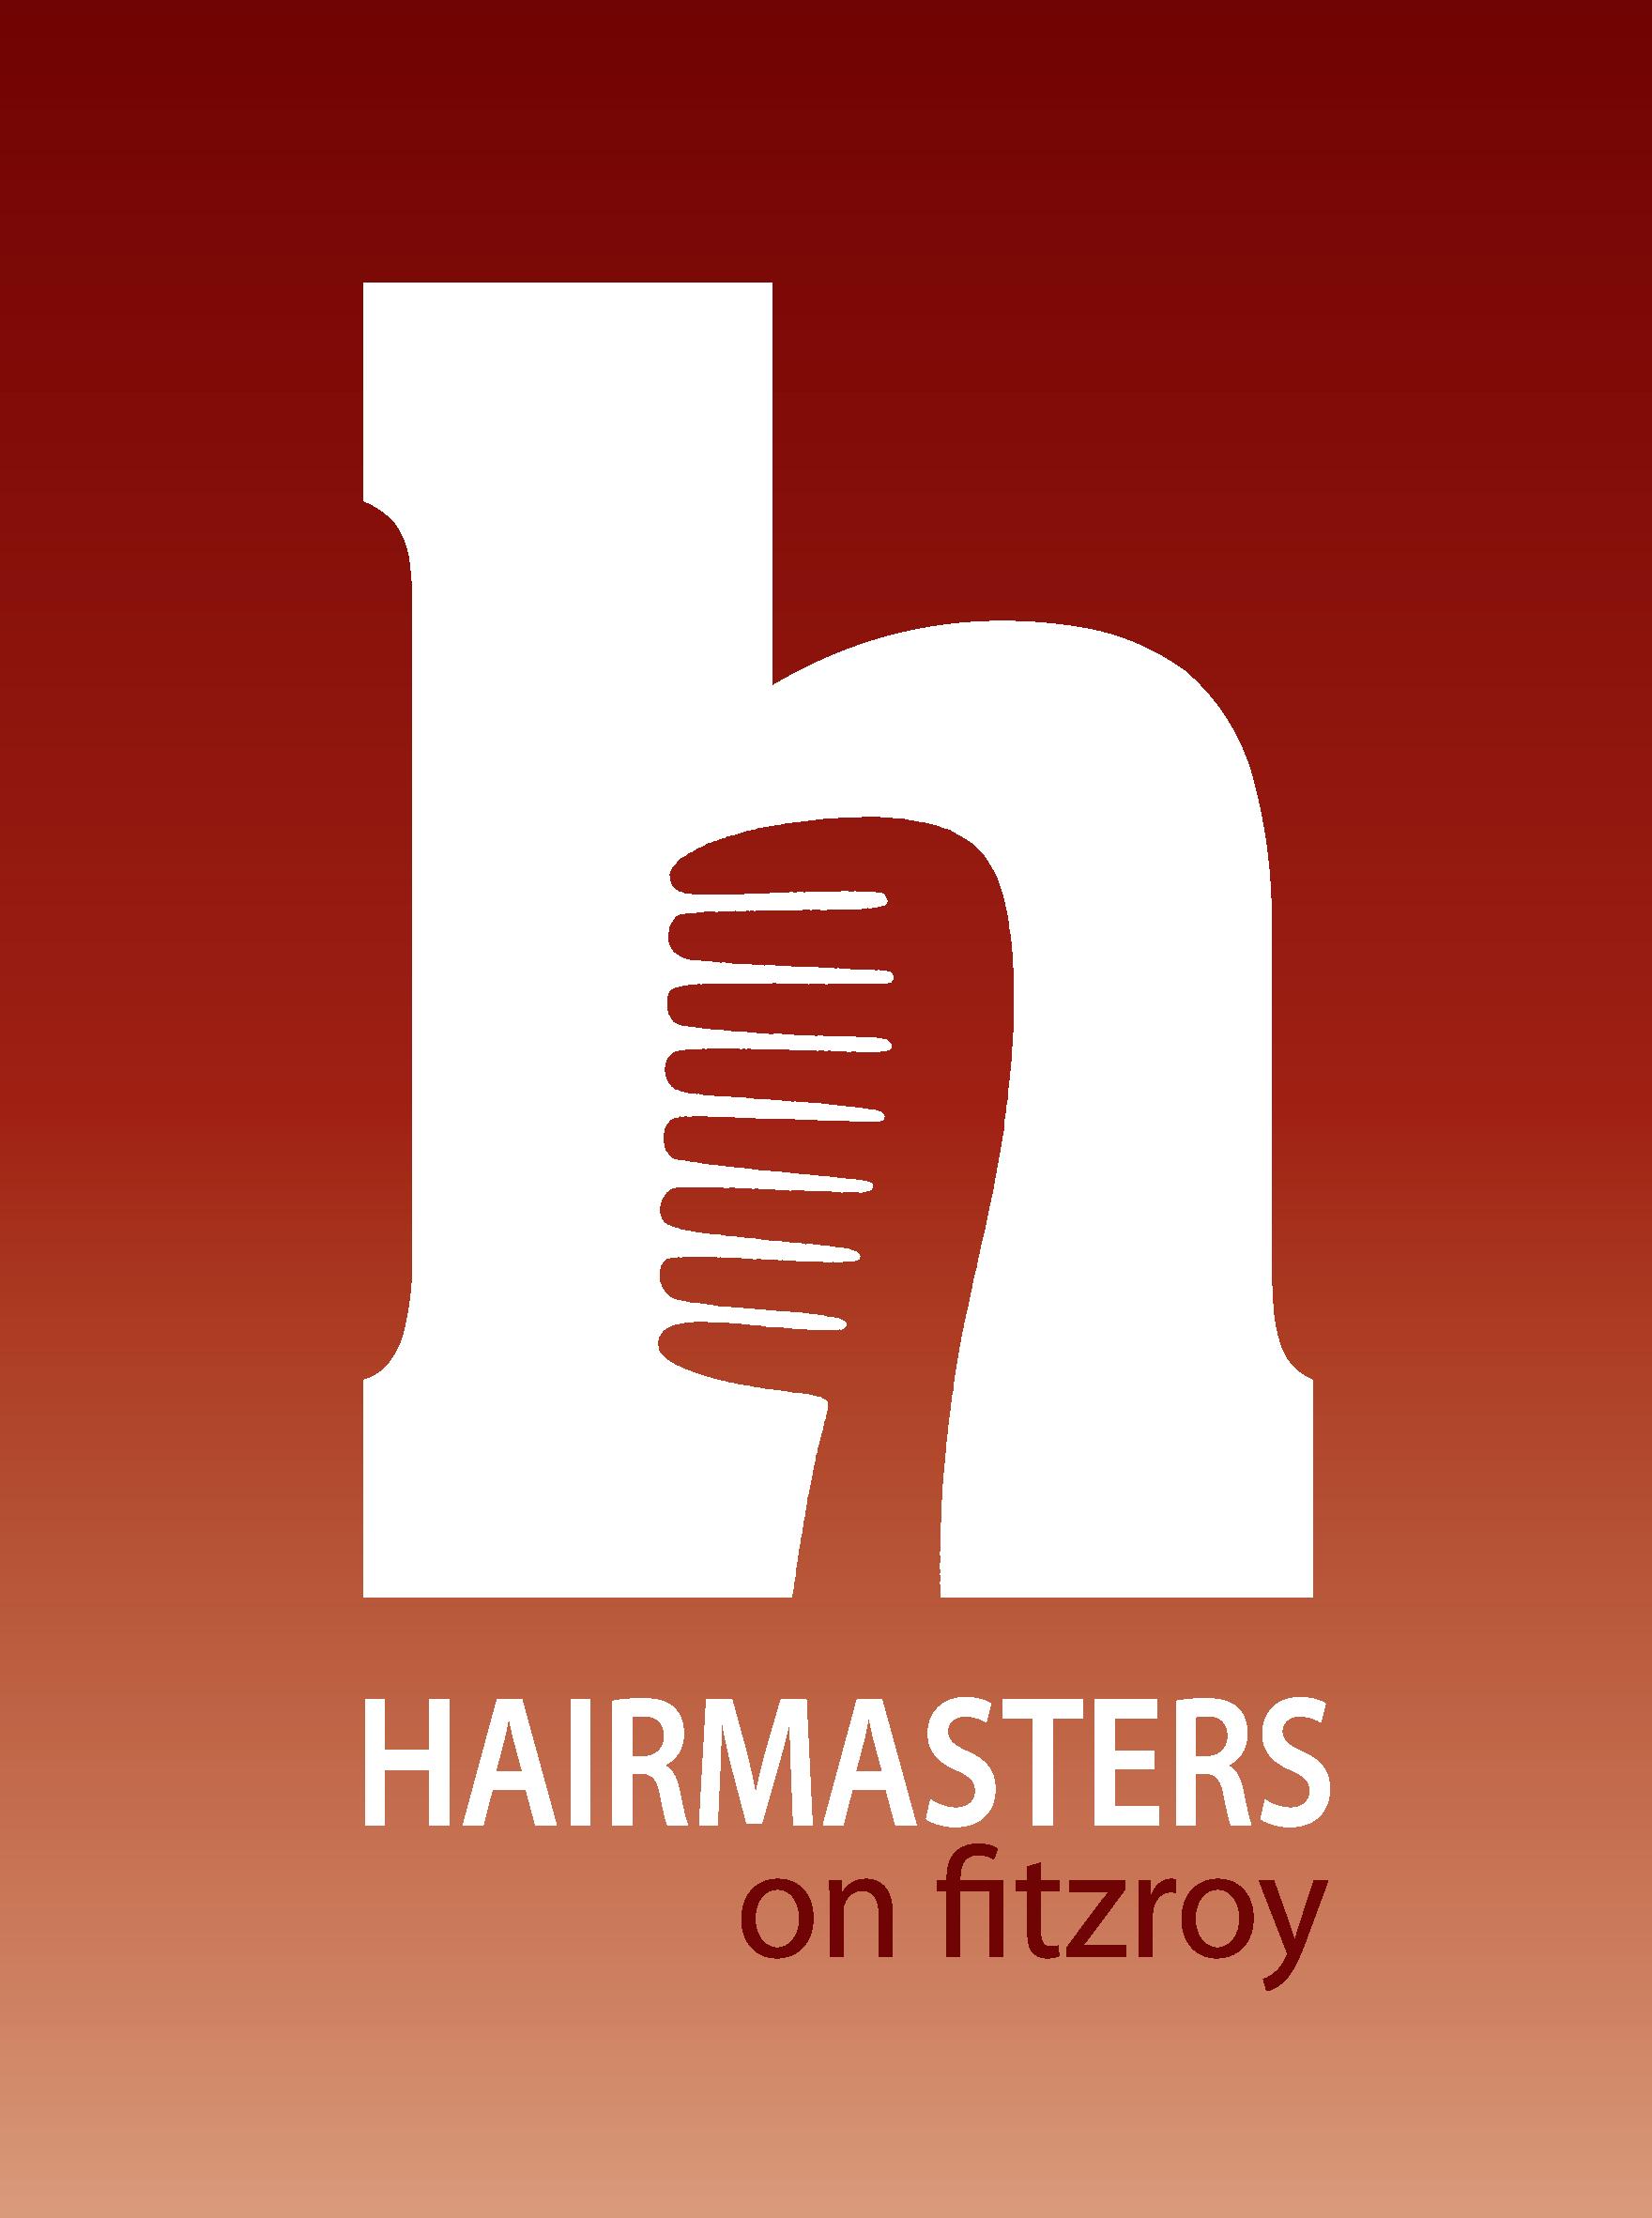 Hairmasters logo short.png